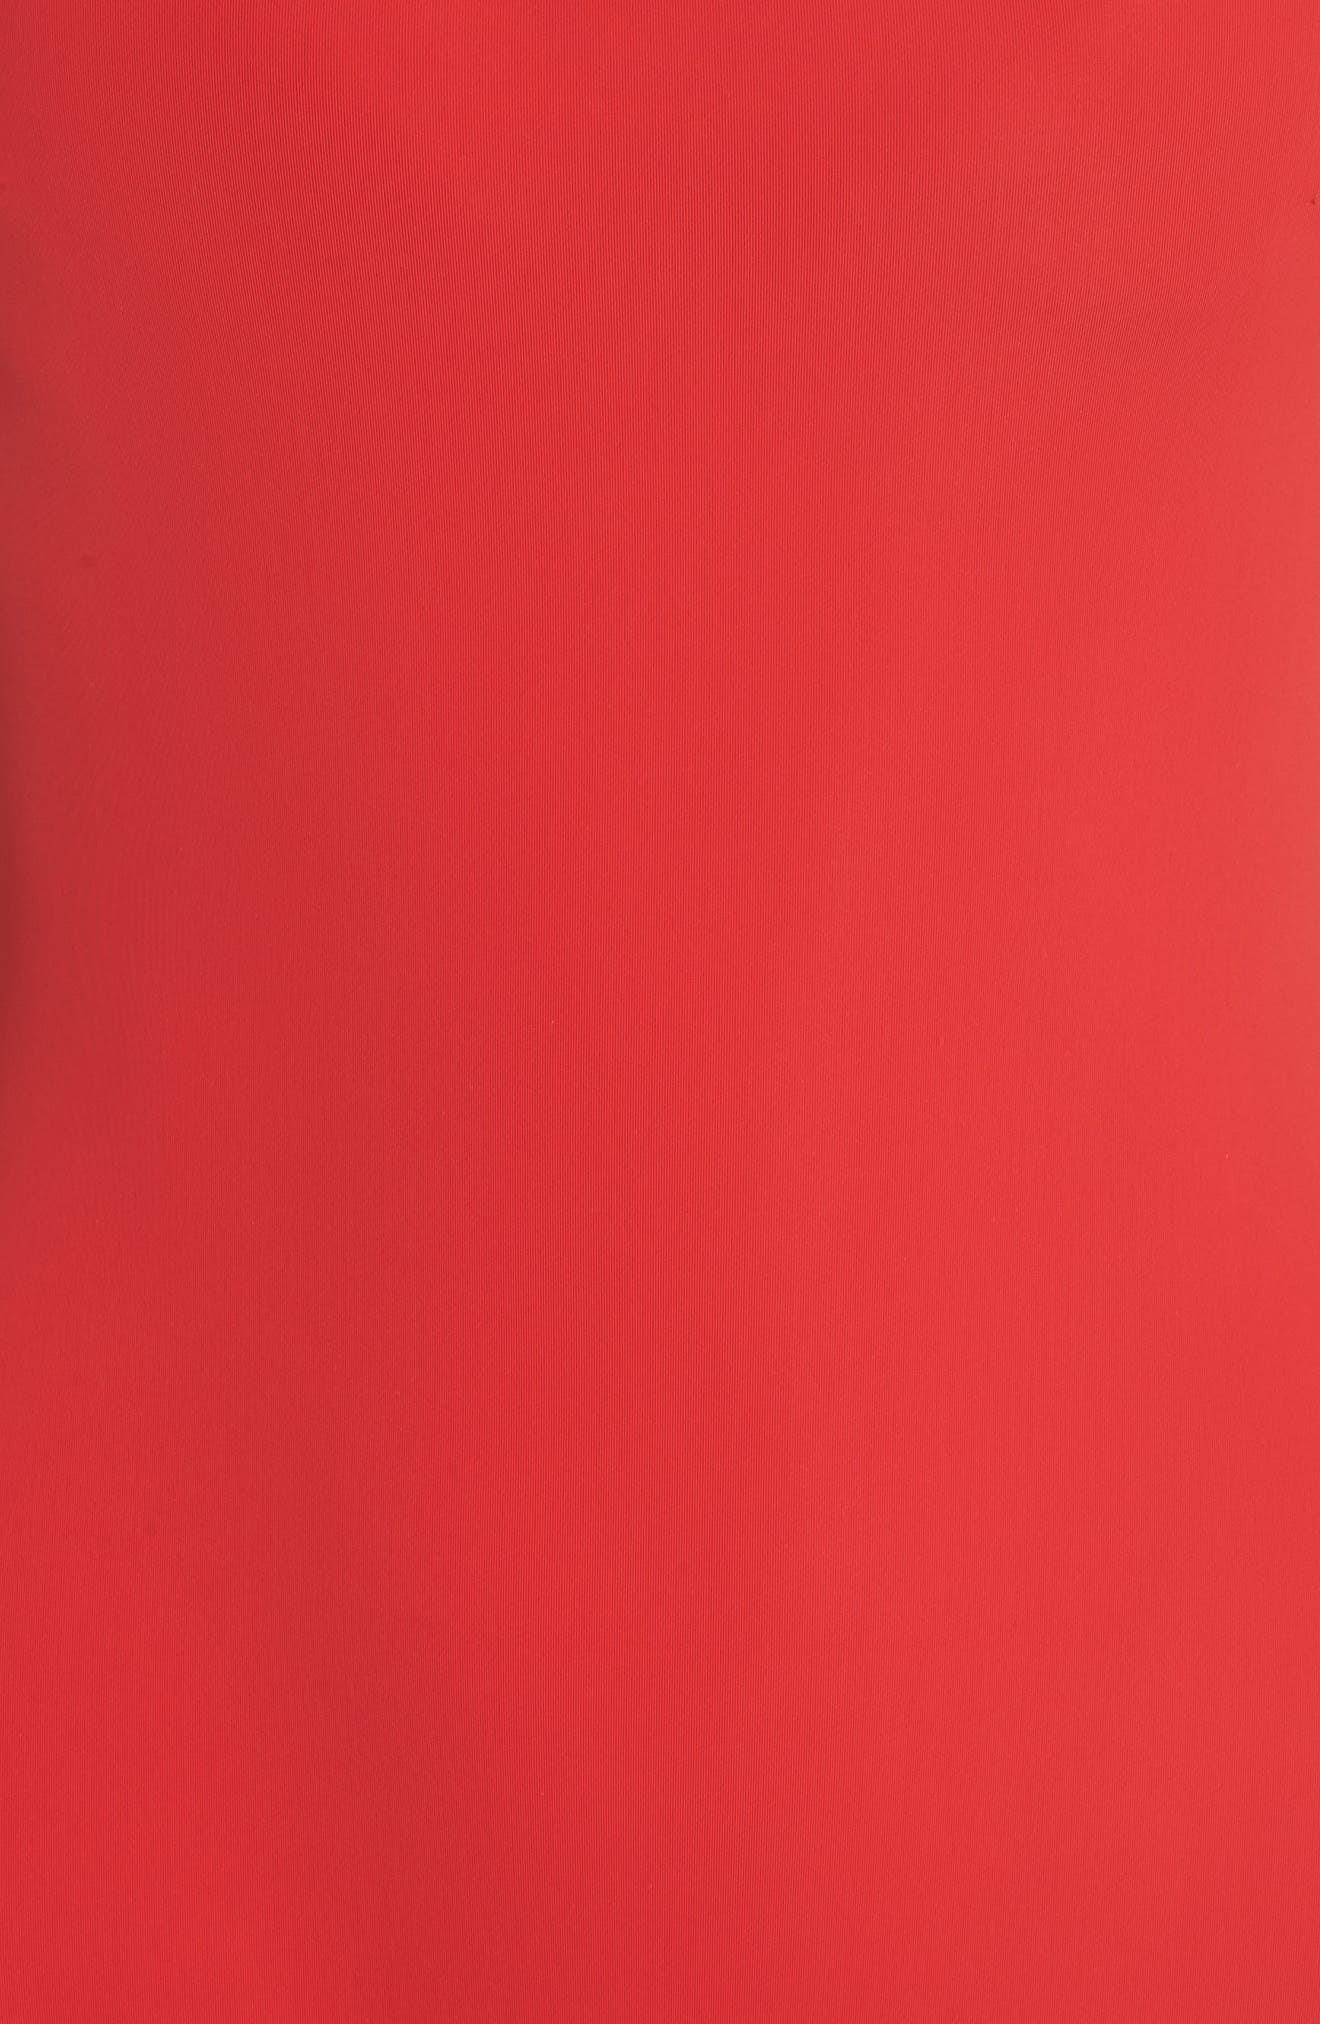 Barrel One-Piece Swimsuit,                             Alternate thumbnail 5, color,                             RED/ ORANGE